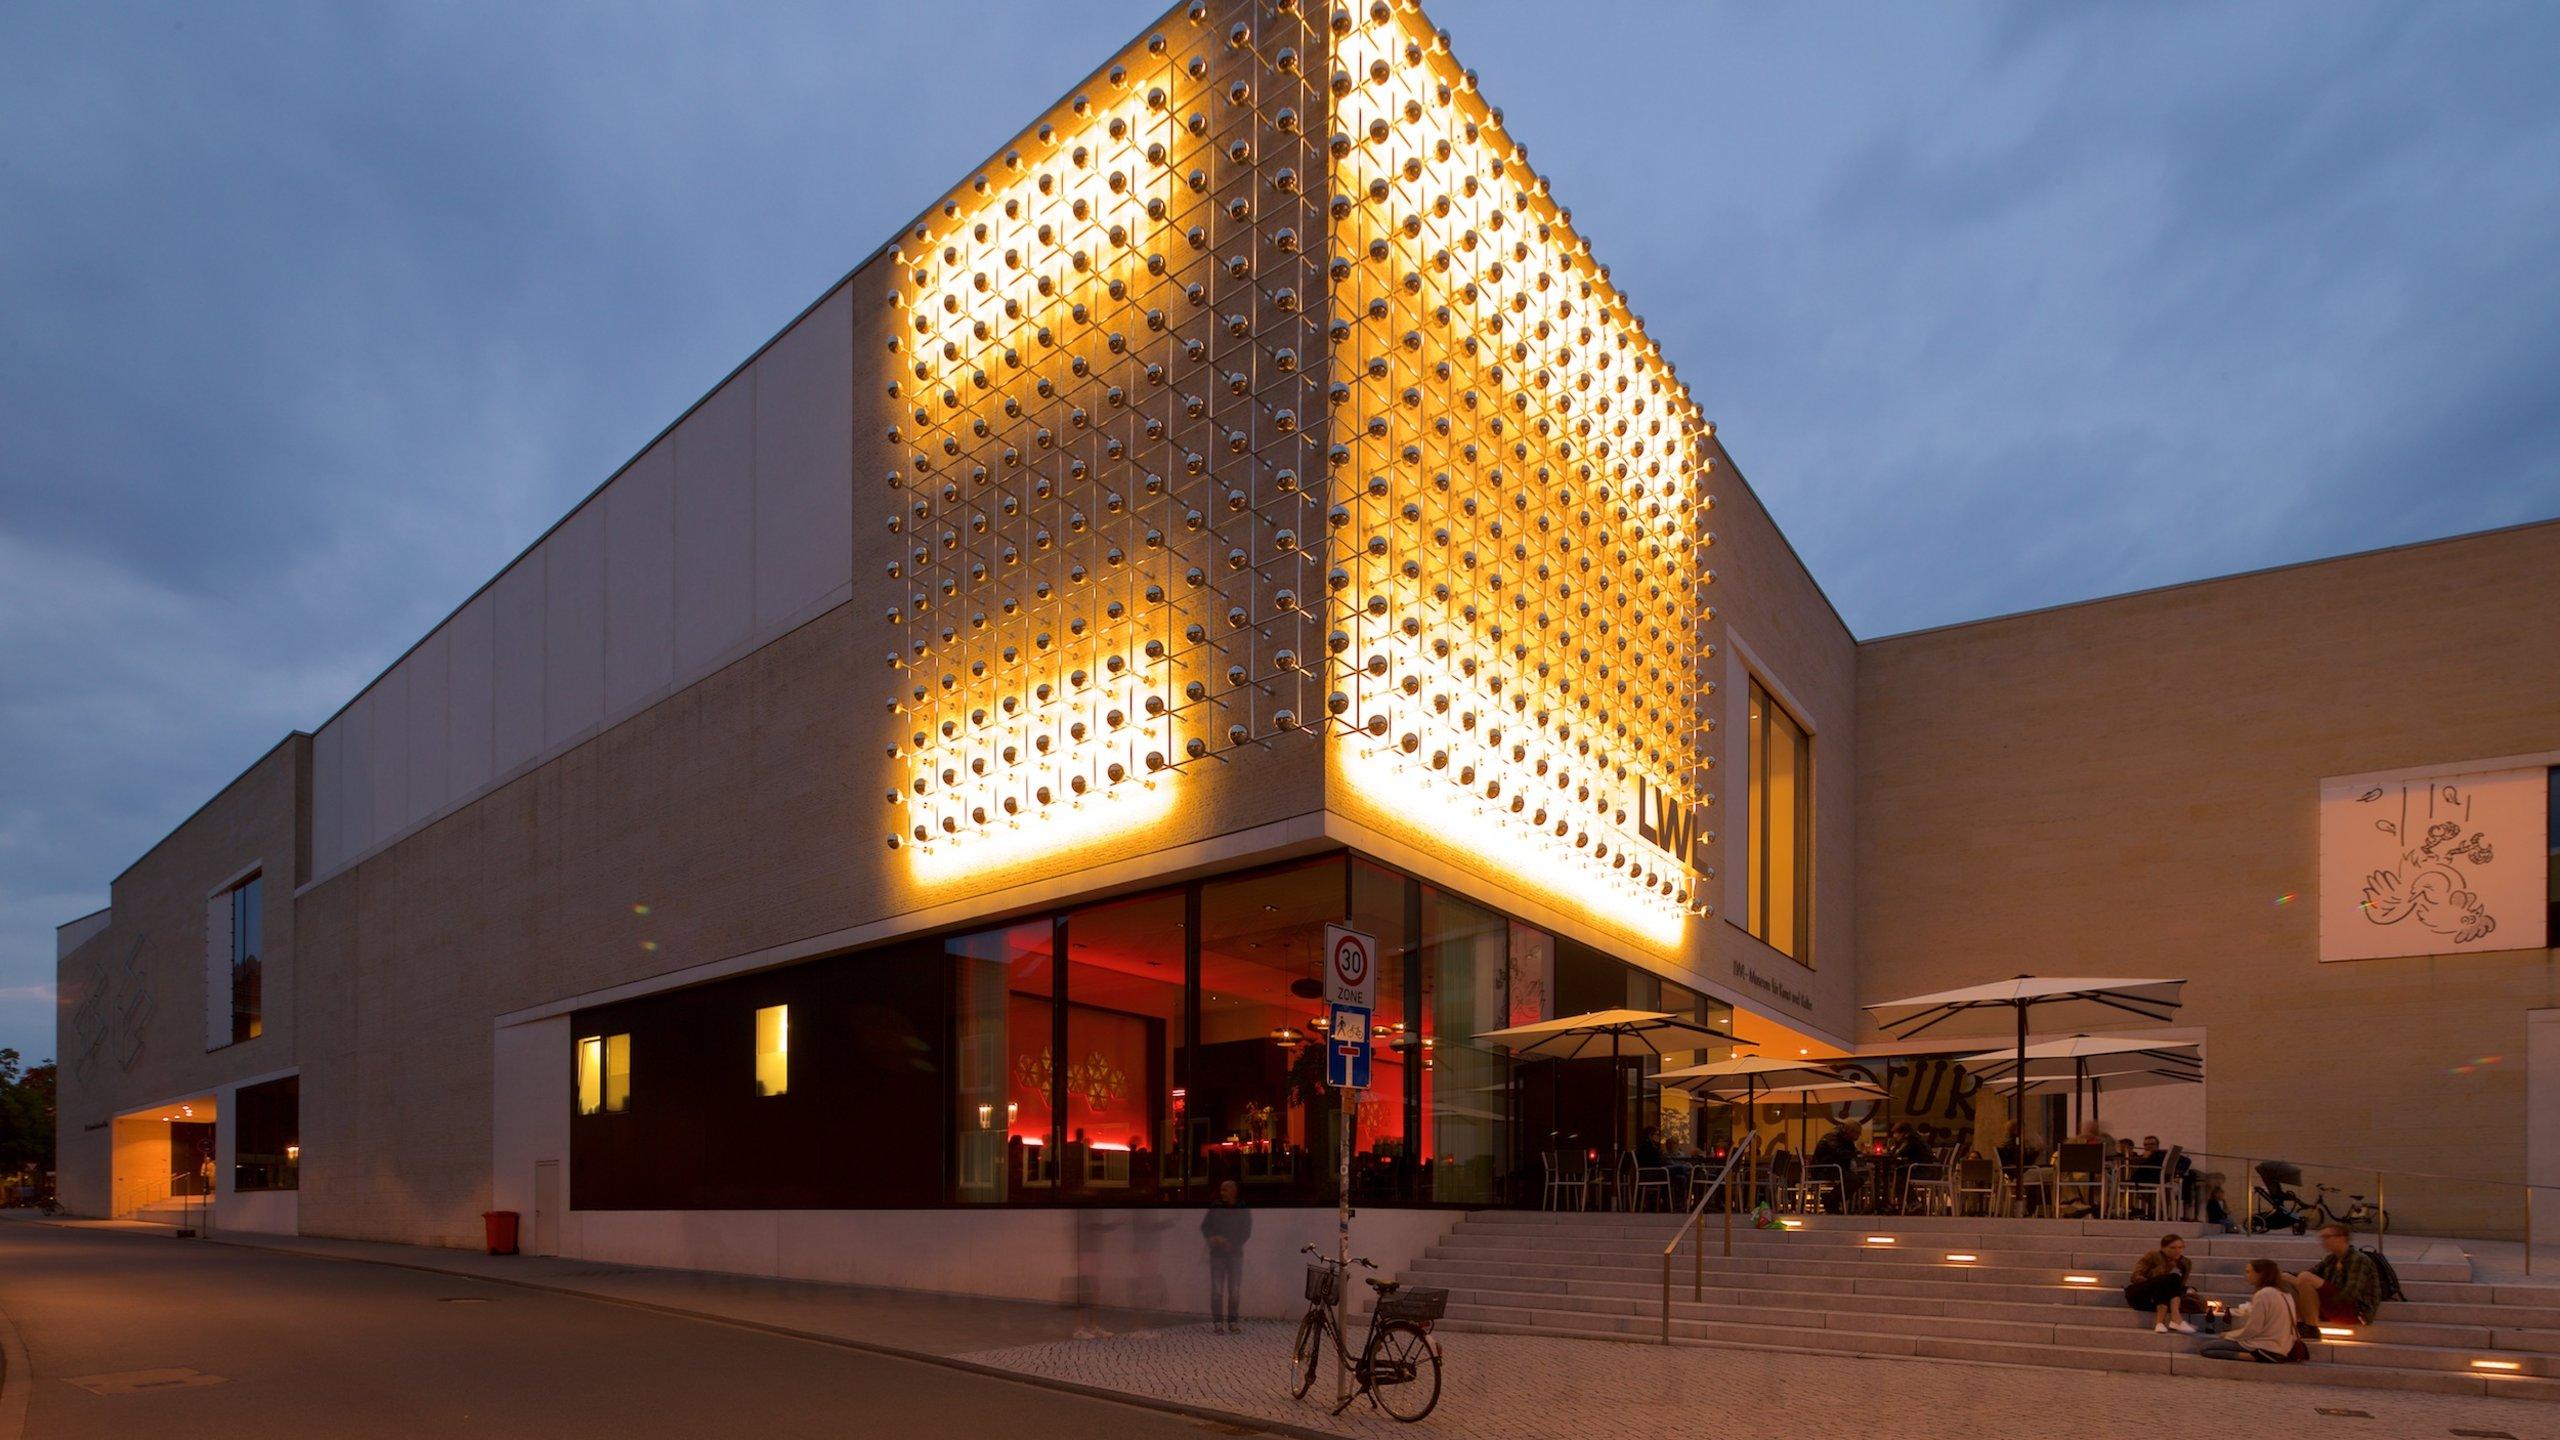 Wellnesshotels Münster, Nordrhein-Westfalen | Hotels Expedia.de